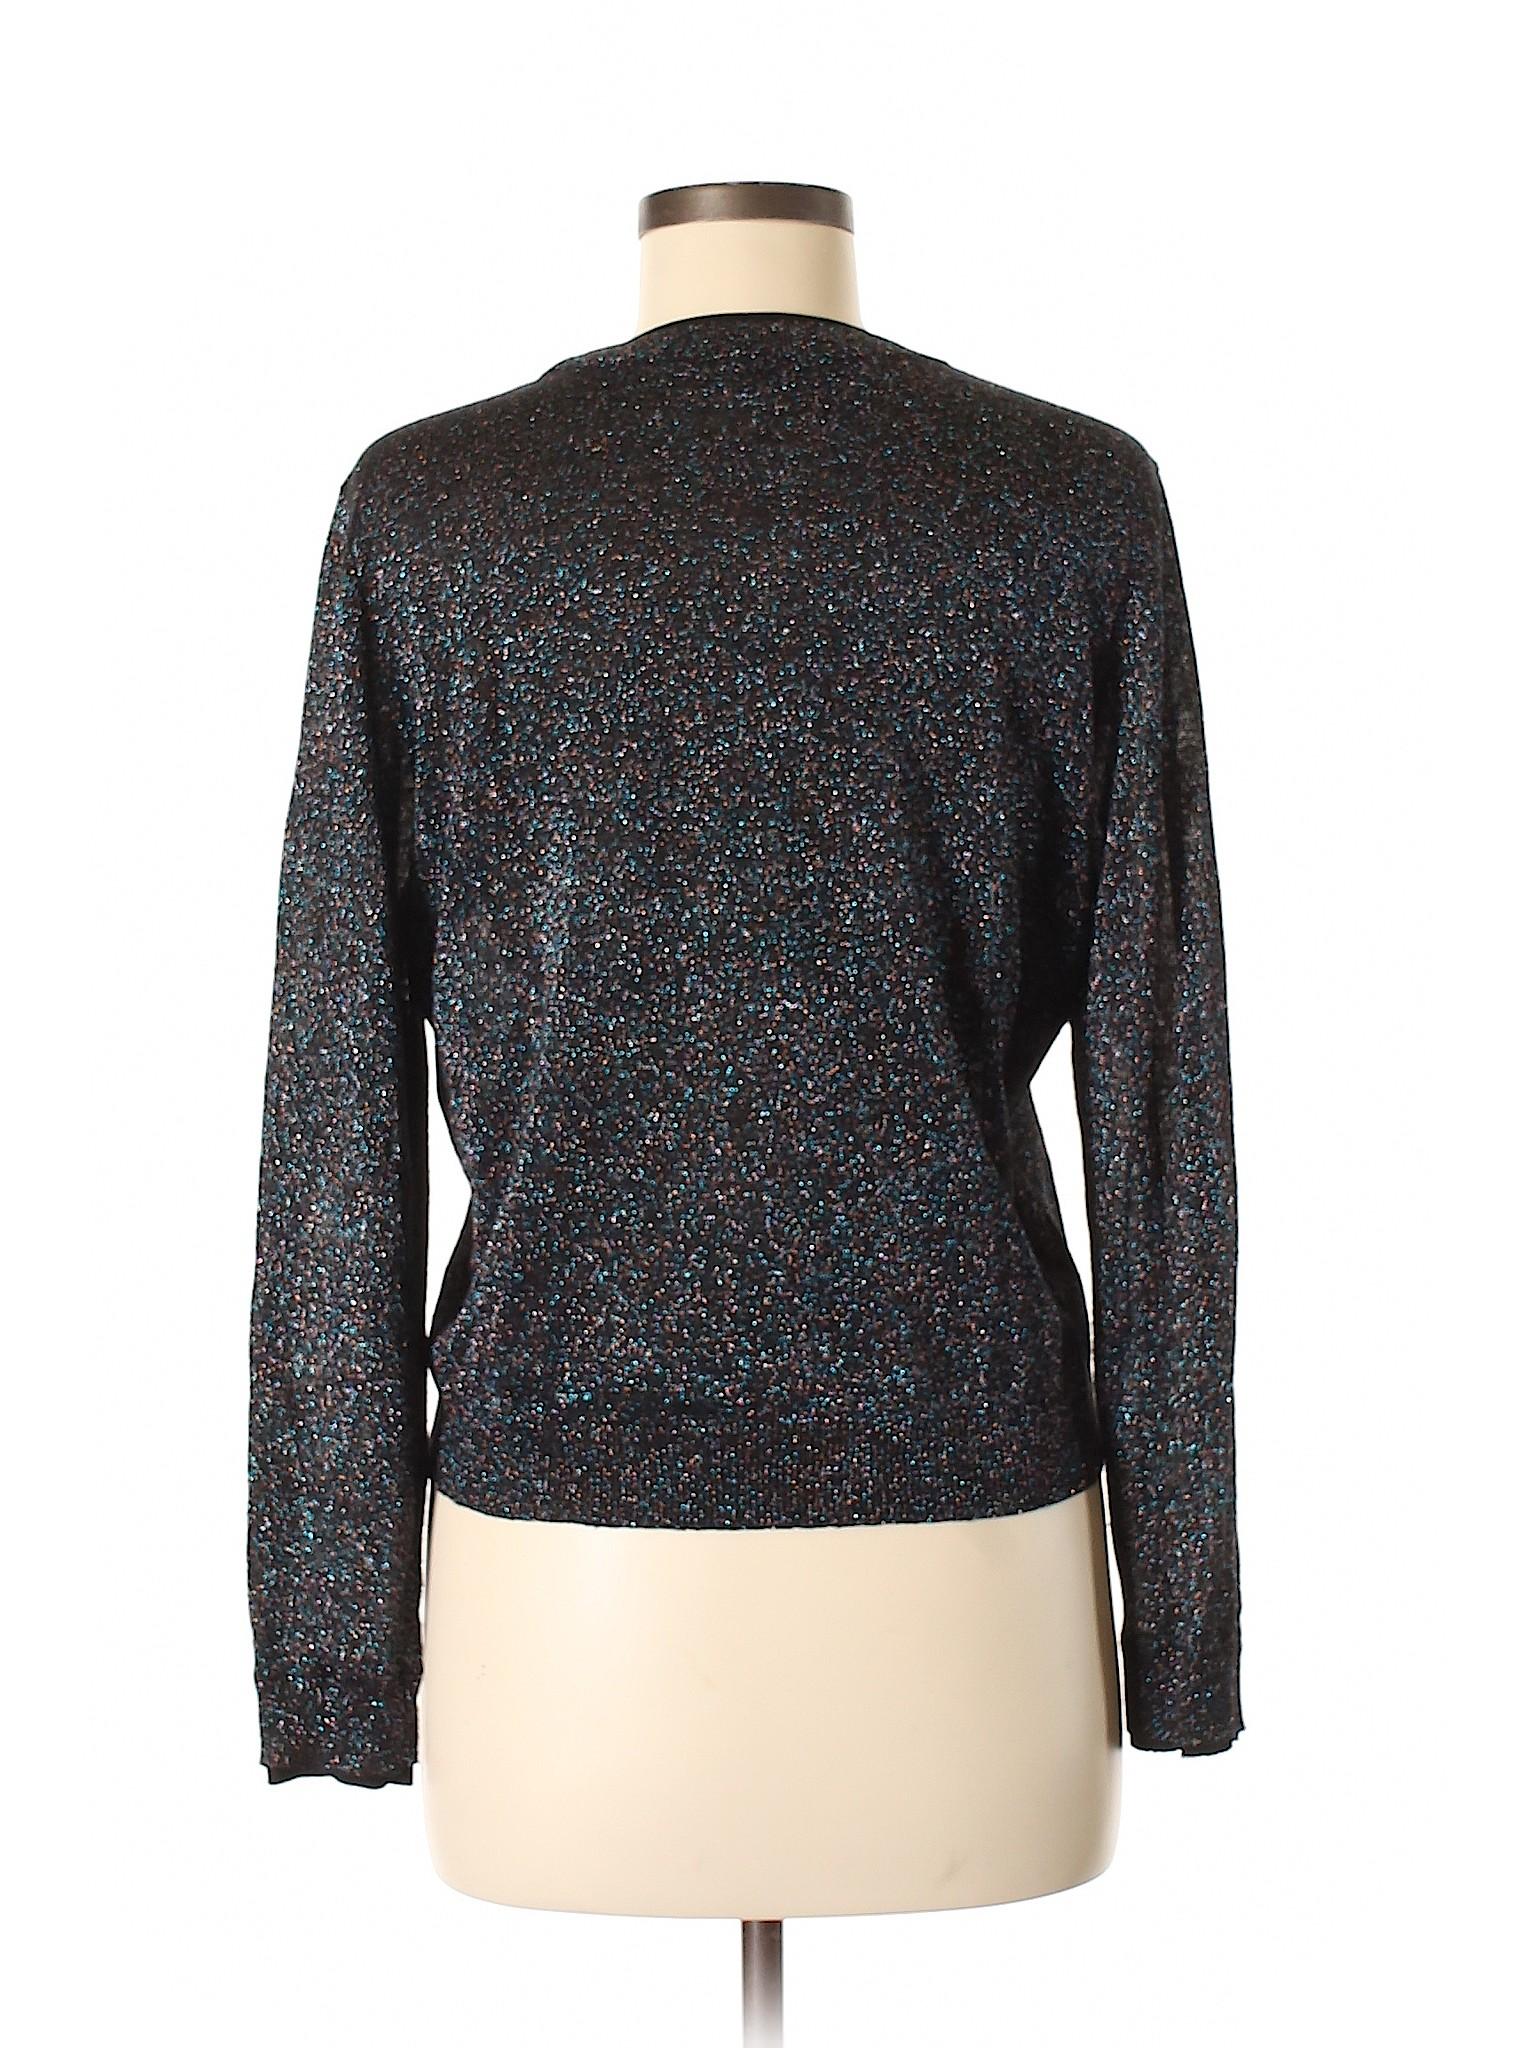 Sweater Topshop Boutique Pullover Boutique Topshop Sweater Boutique Pullover wqx5HtE